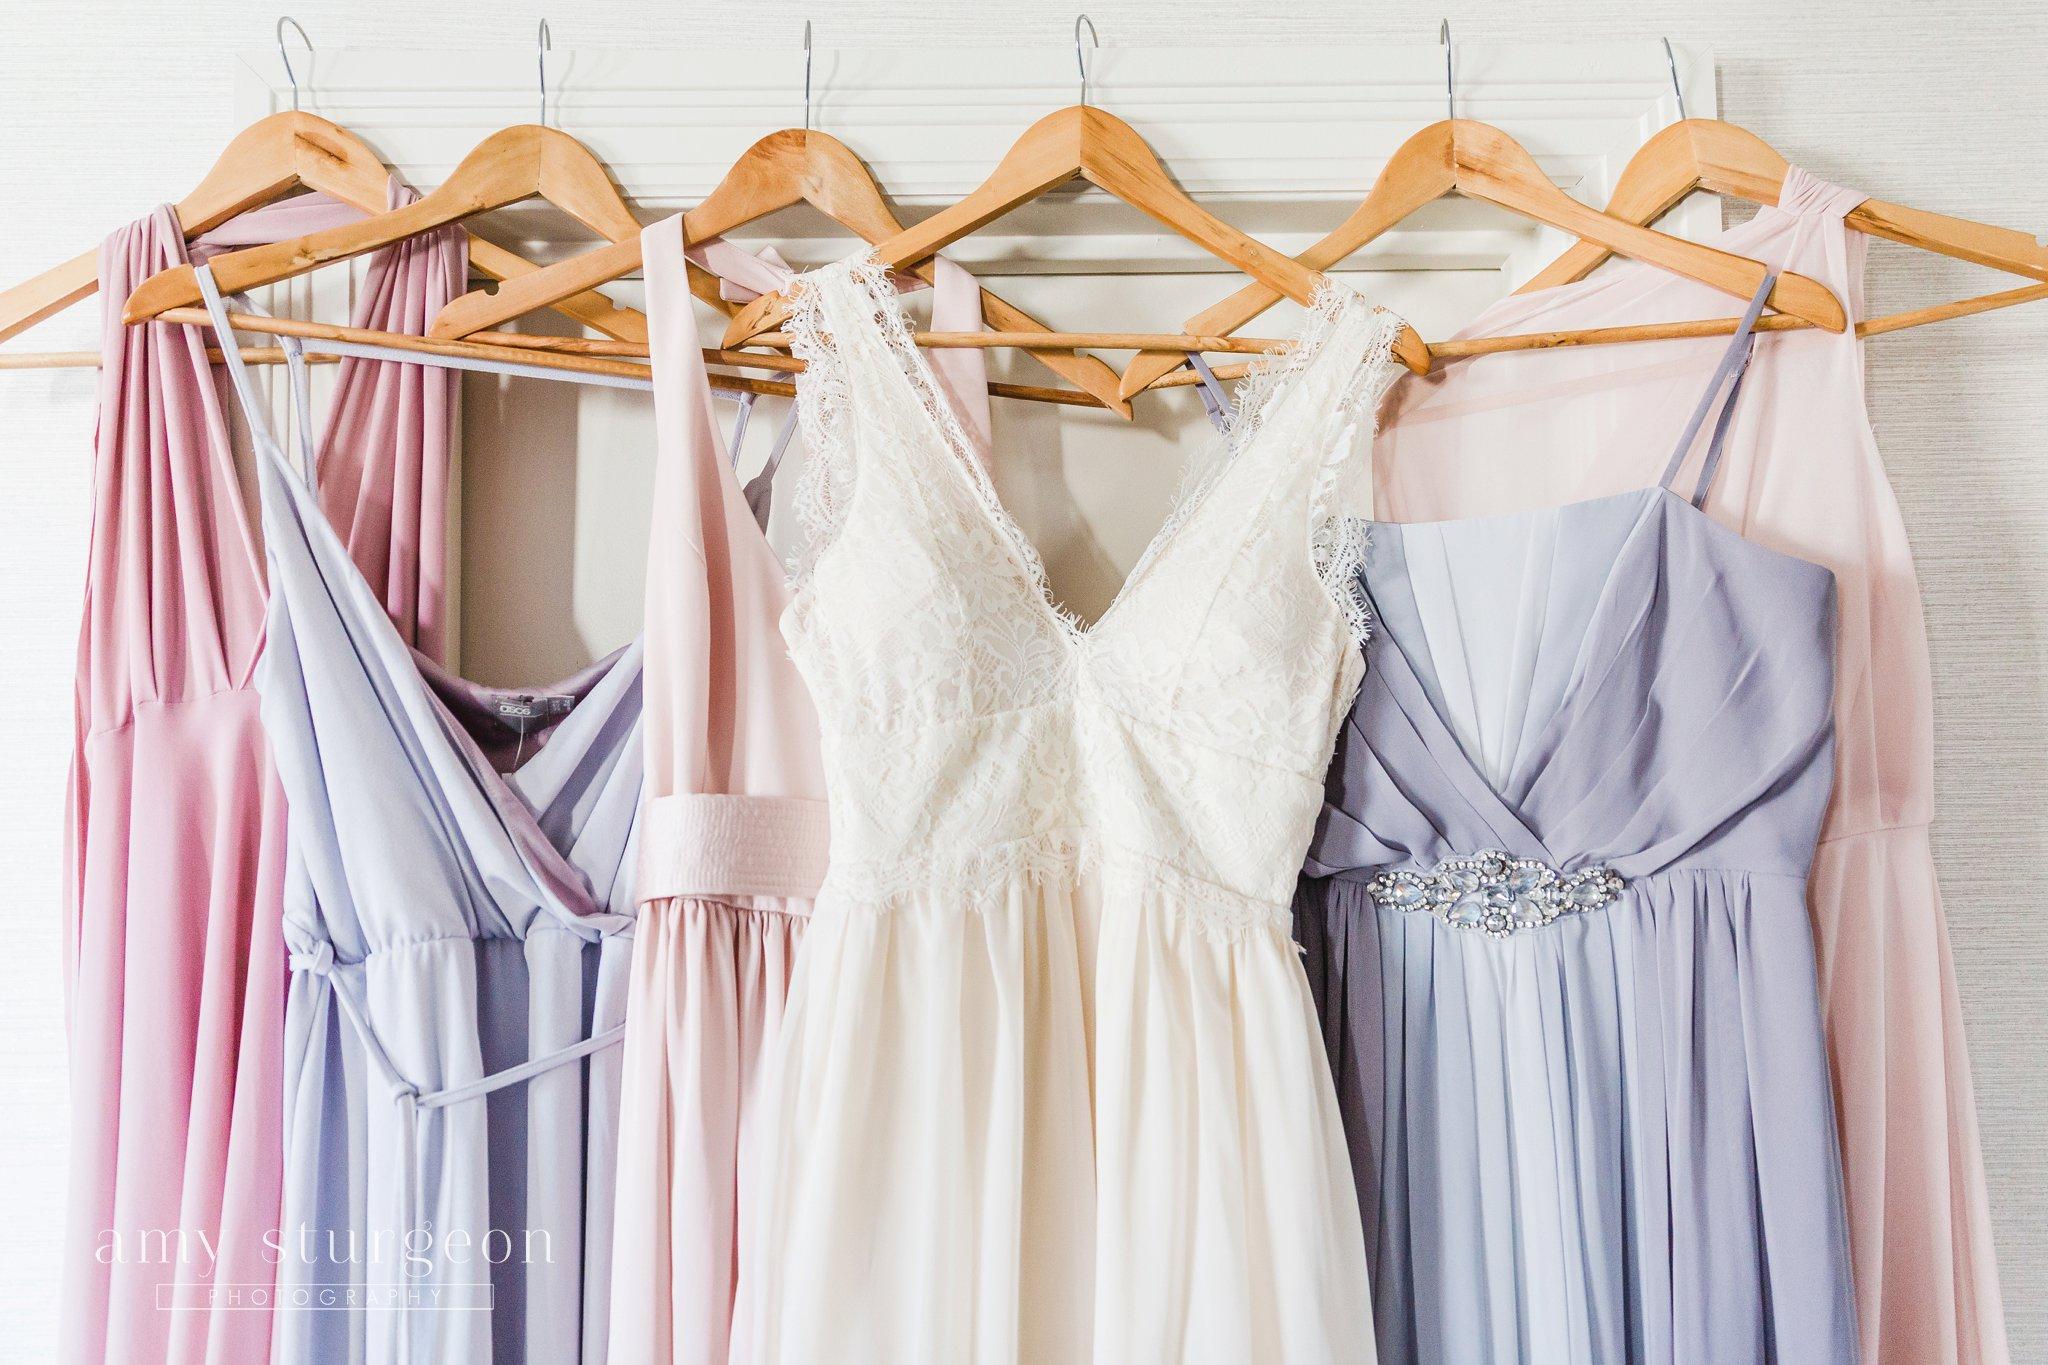 Pastel bridesmaids dresses at the aviation museum wedding